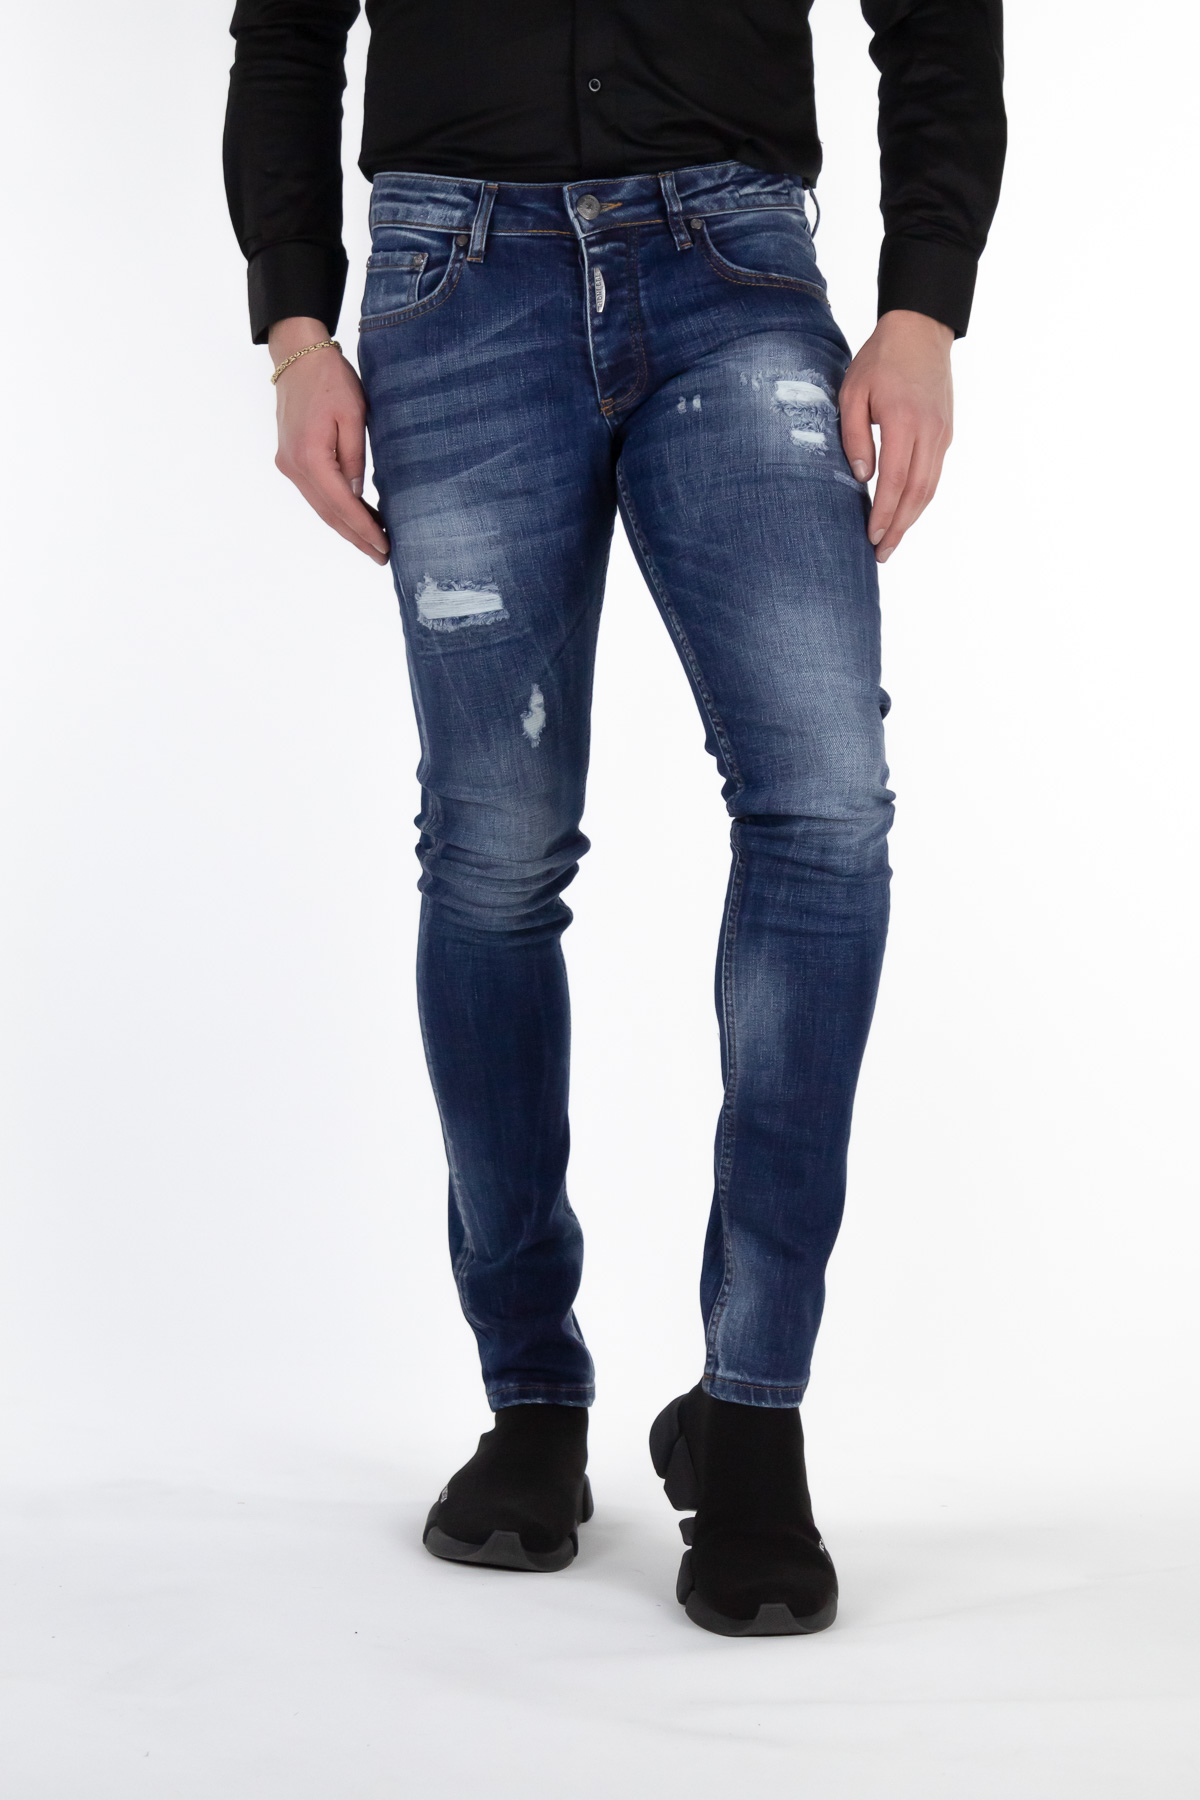 Richesse Charleroi Blue Jeans 2240-1